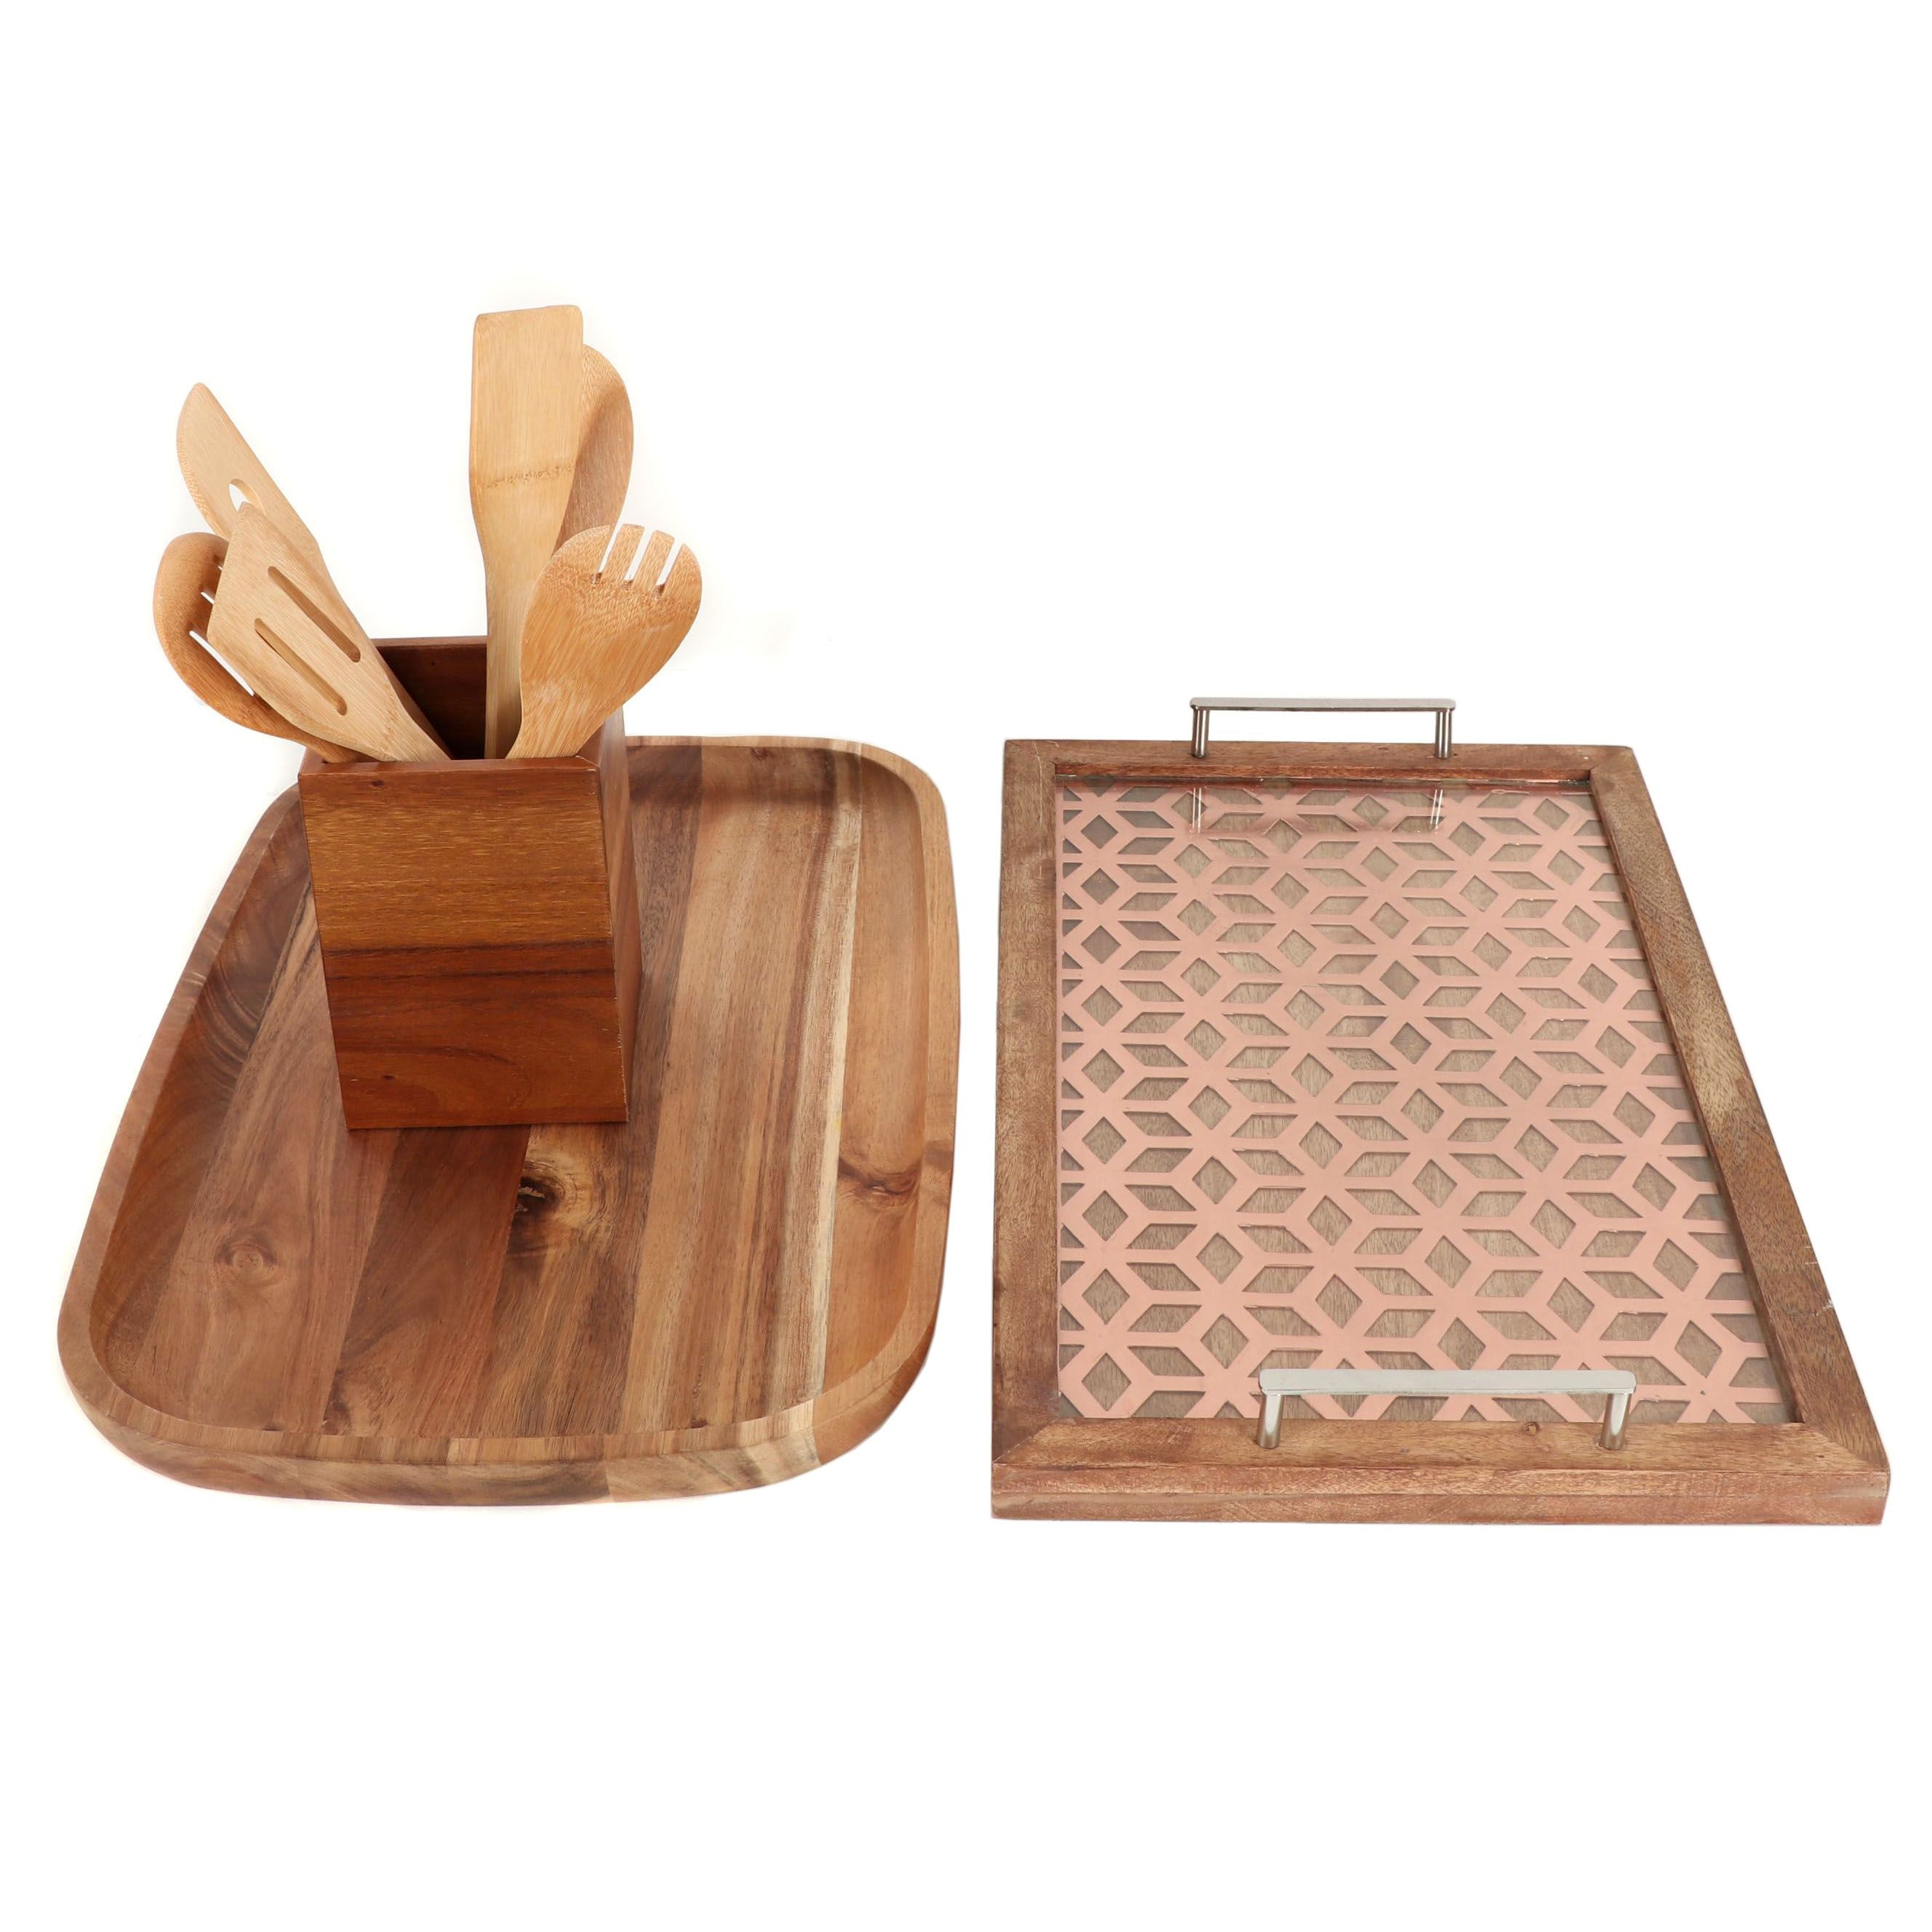 Wooden Serving Trays with Kitchen Utensils